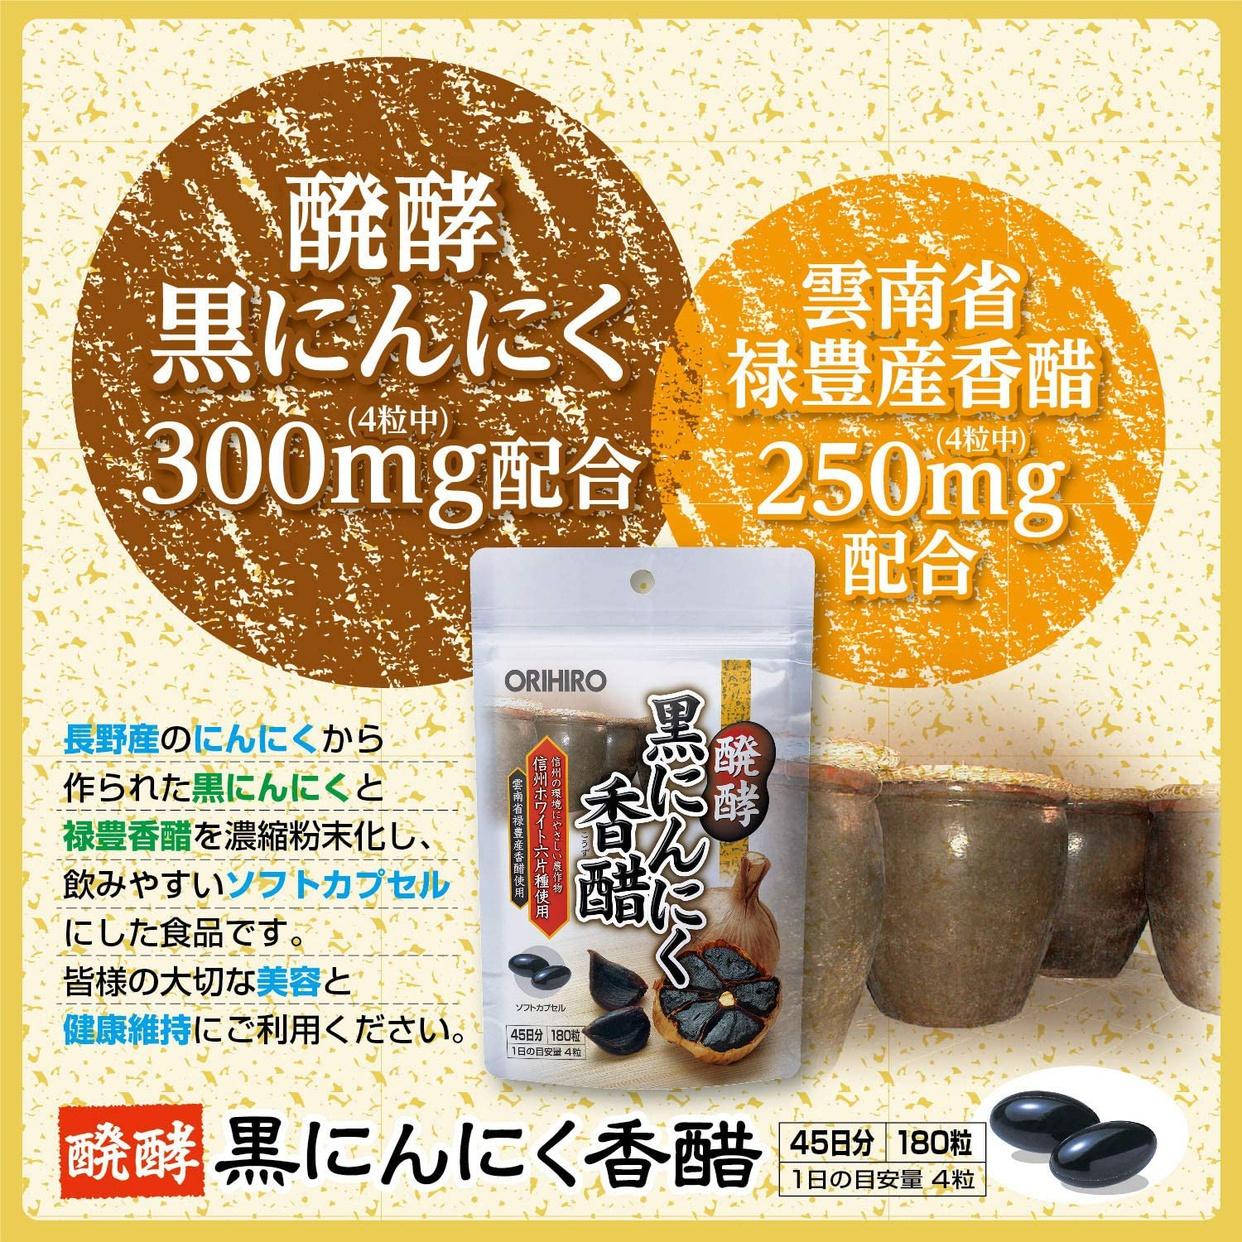 ORIHIRO(オリヒロ) 醗酵黒にんにく香醋の商品画像4